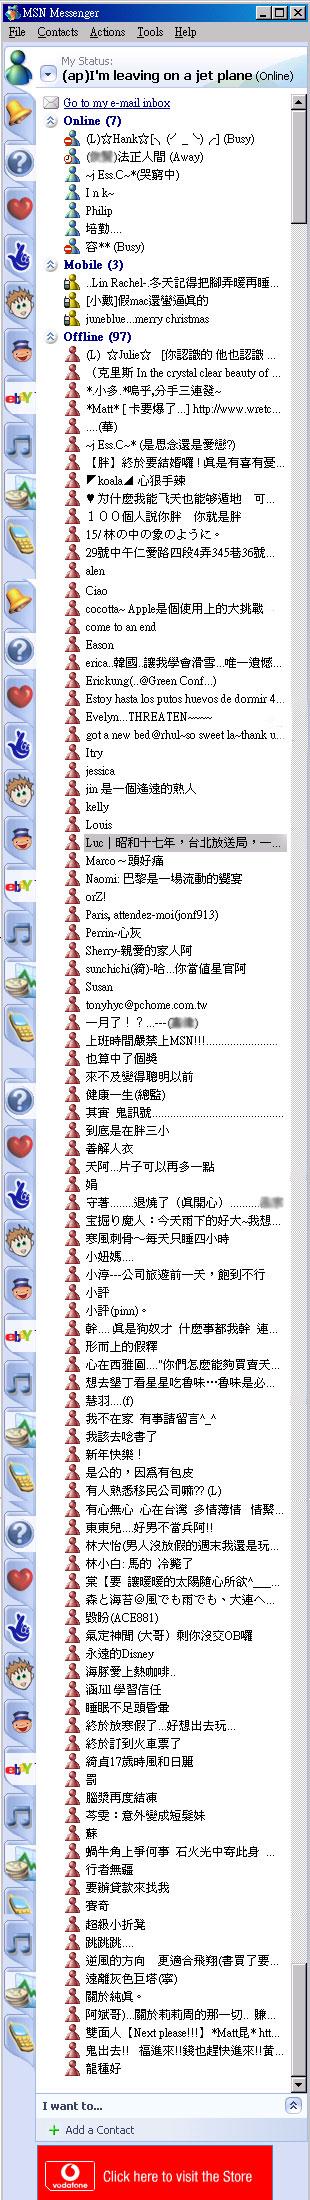 MSN主視窗